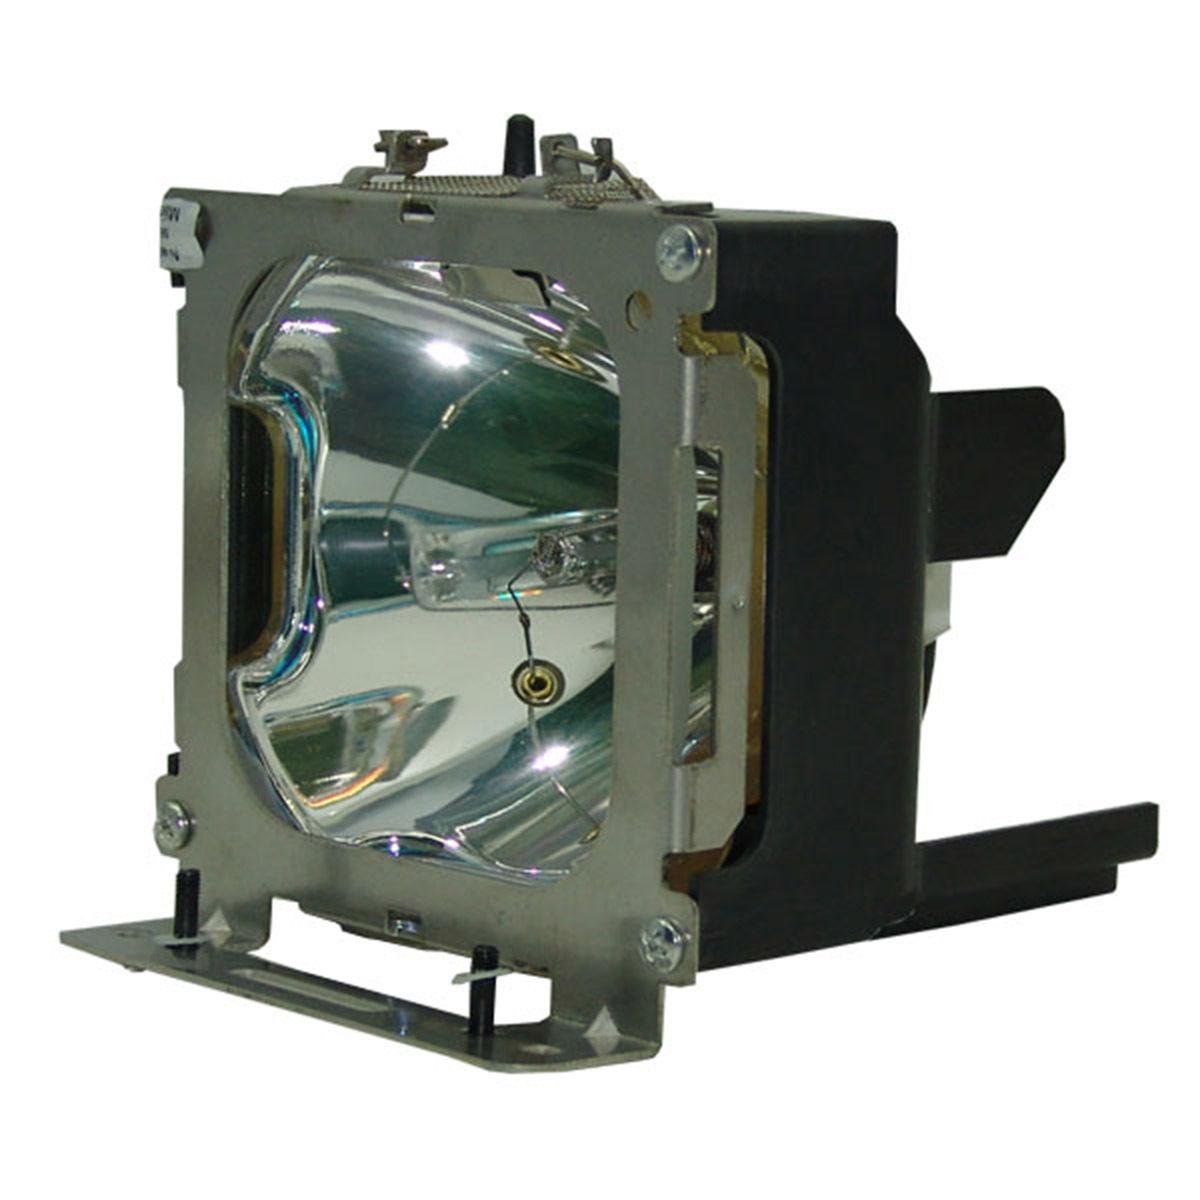 Projector Lamp Bulb RLC-002 RLC002 for VIEWSONIC PJ755D / PJ755D-2 with housing projector lamp bulb rlc 013 rlc013 lamp